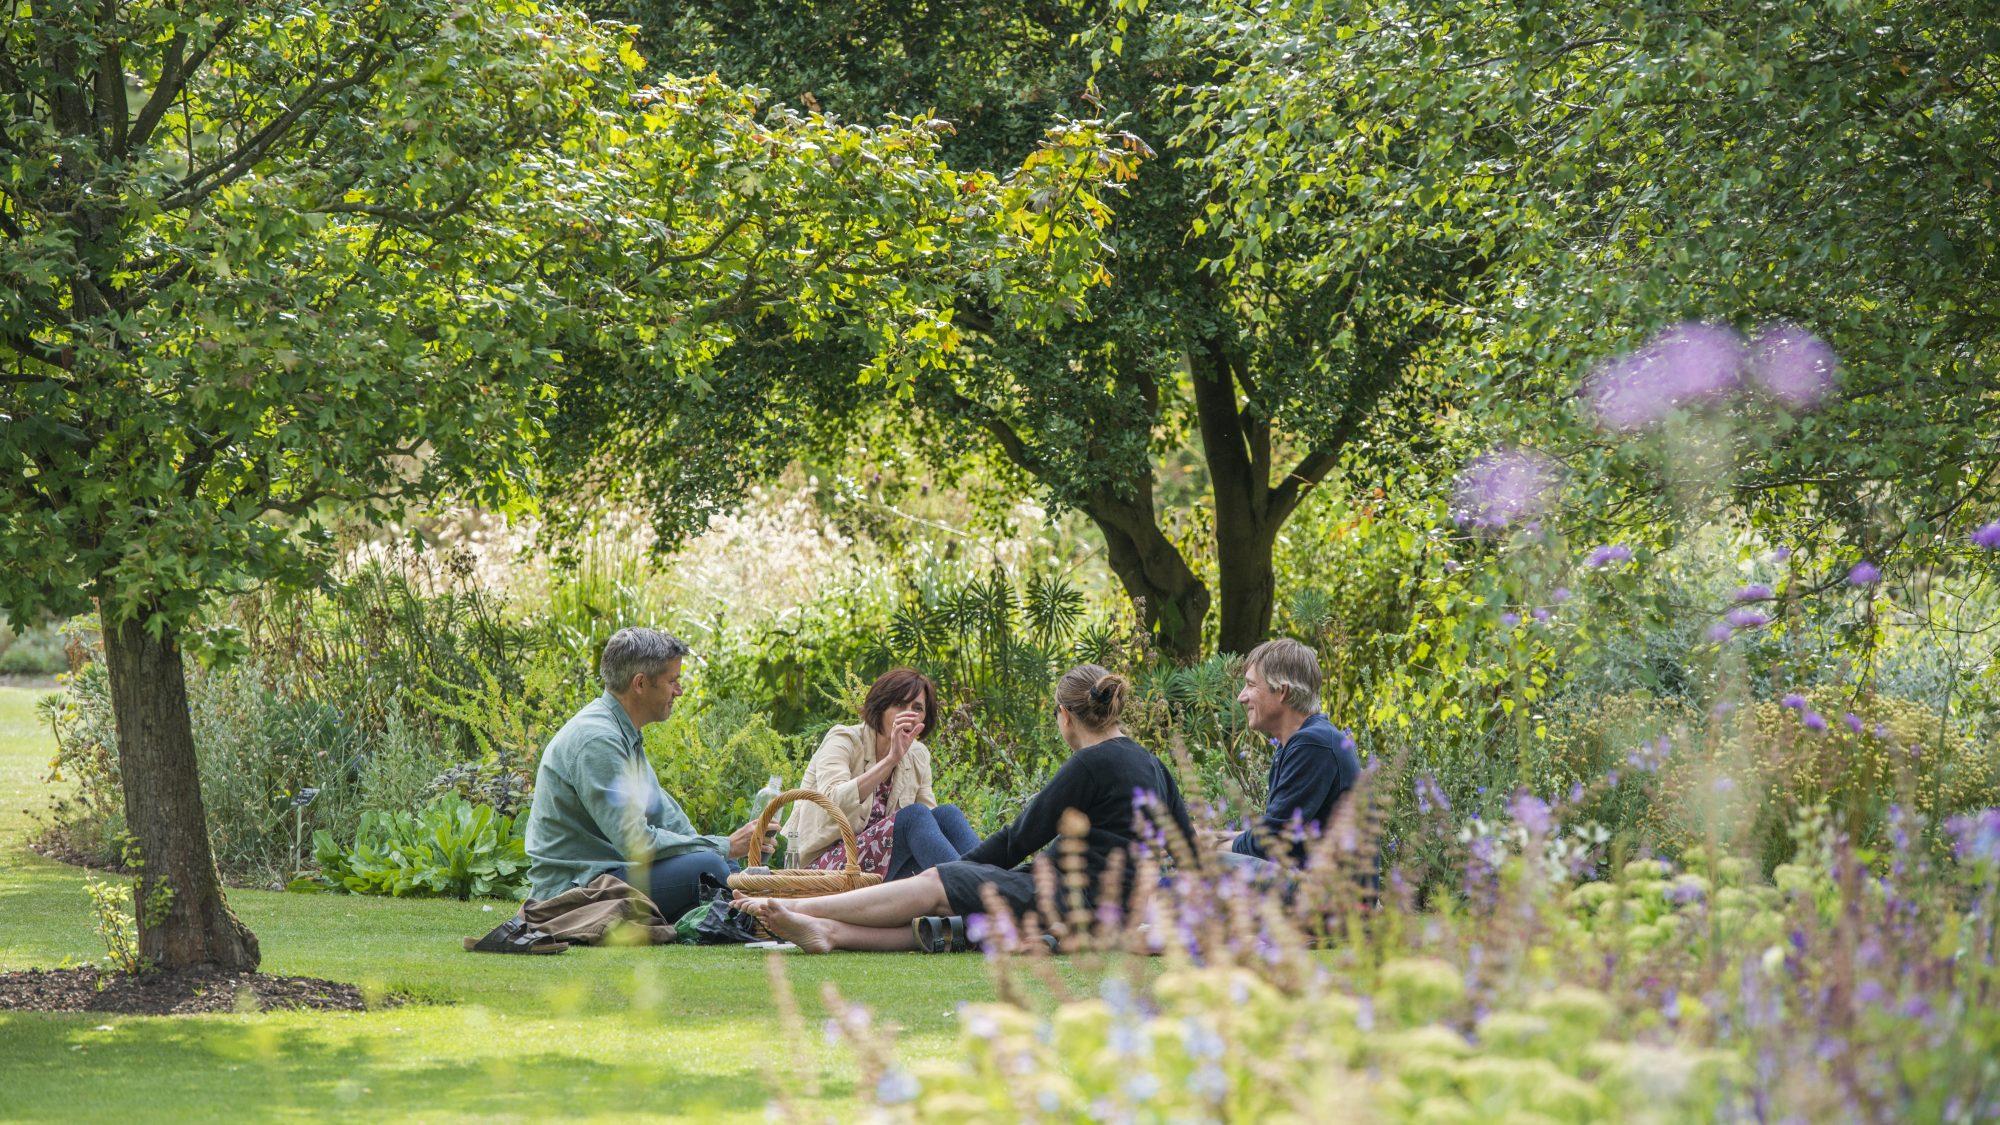 Visitors enjoying a picnic.